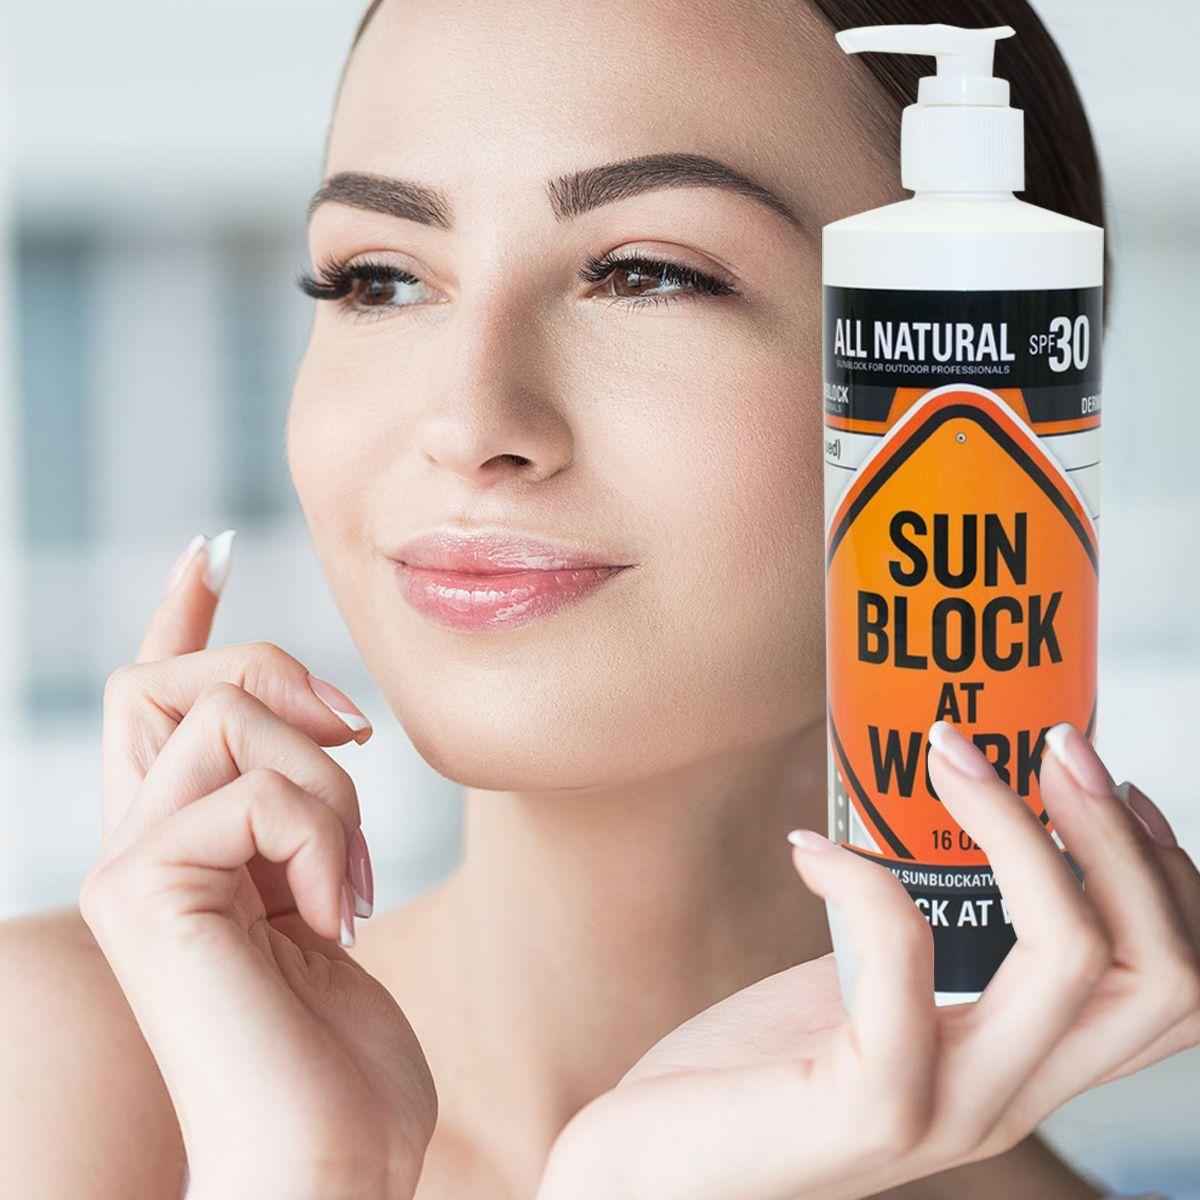 Sunblock at Work SPF 30 AllNatural Organic Zinc Oxide